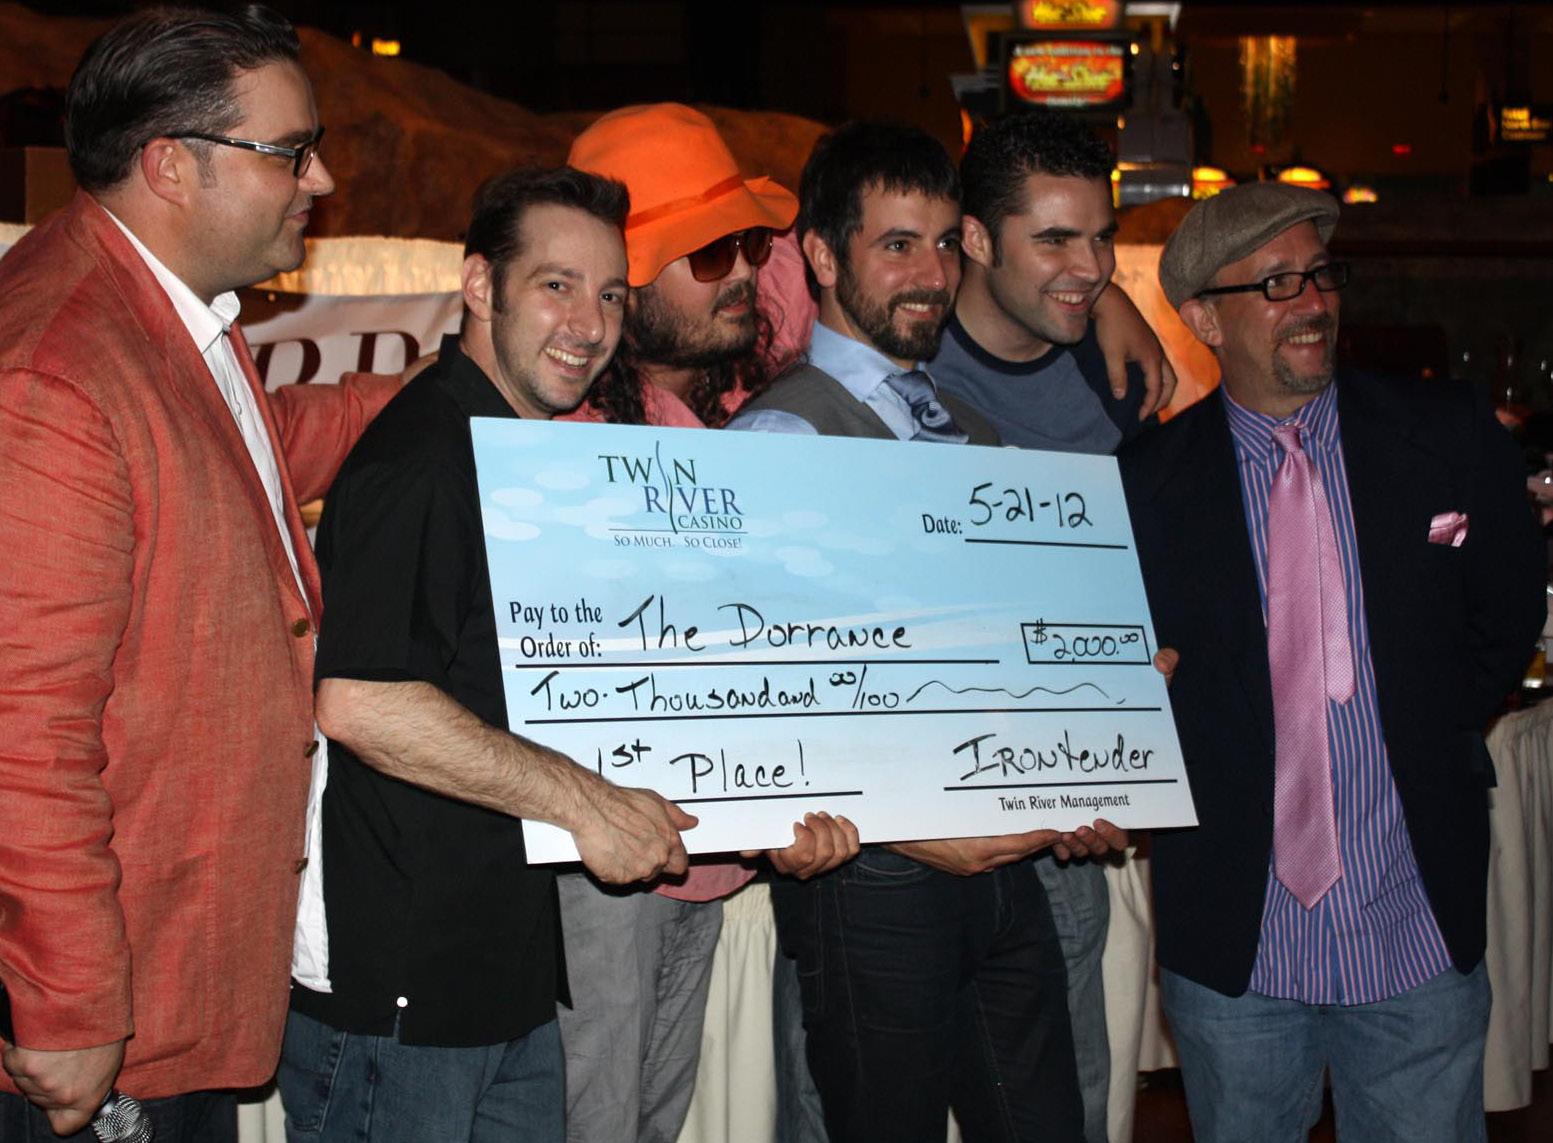 Local News: Irontender 2012